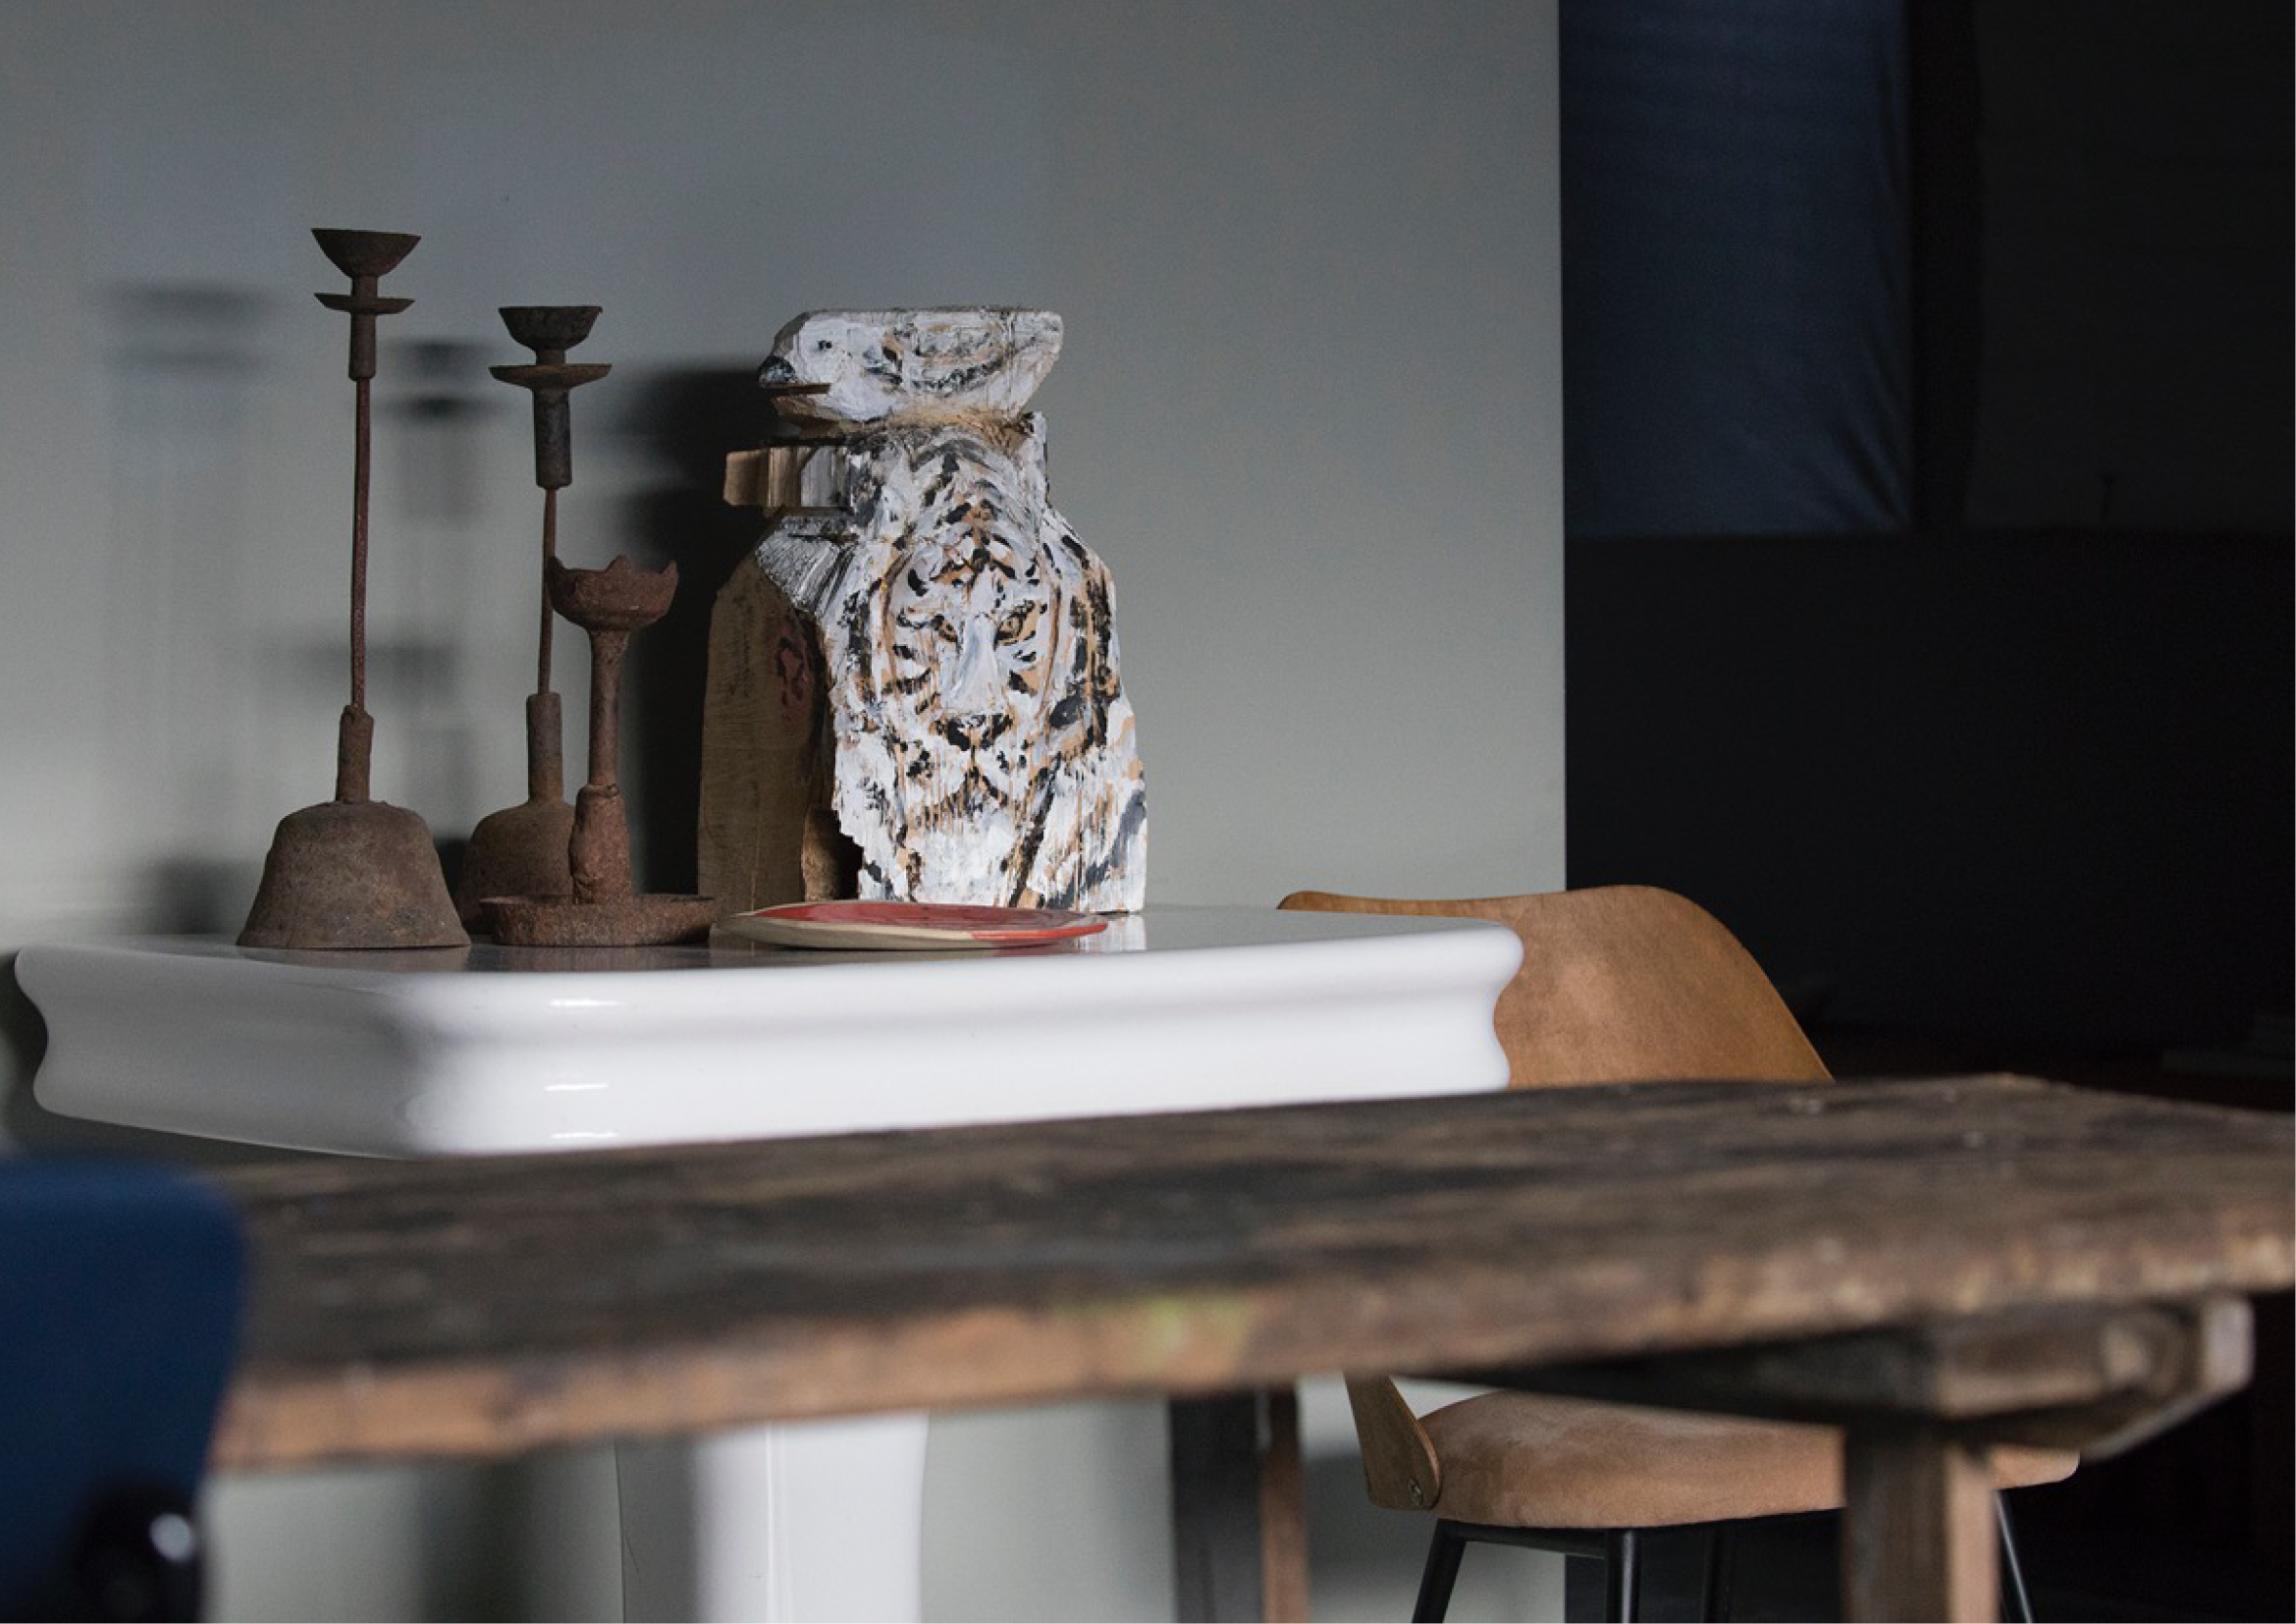 nicoletta-dalfino-erjan-borren-imagery